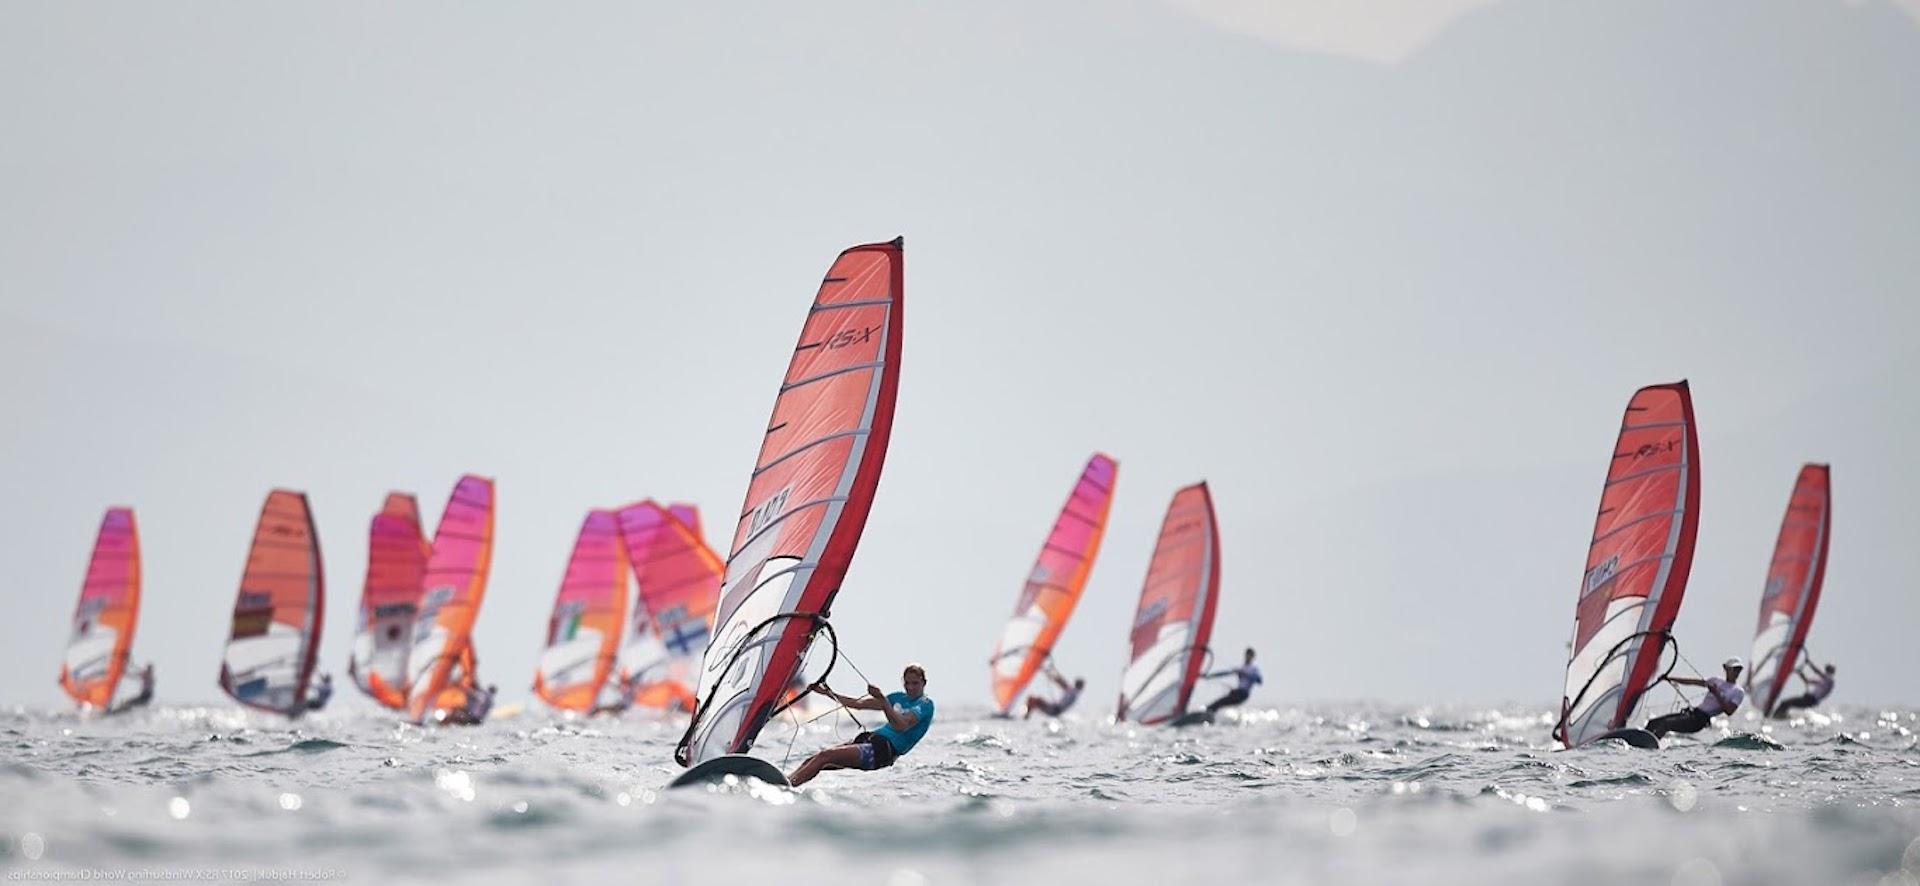 Windsurf RSX